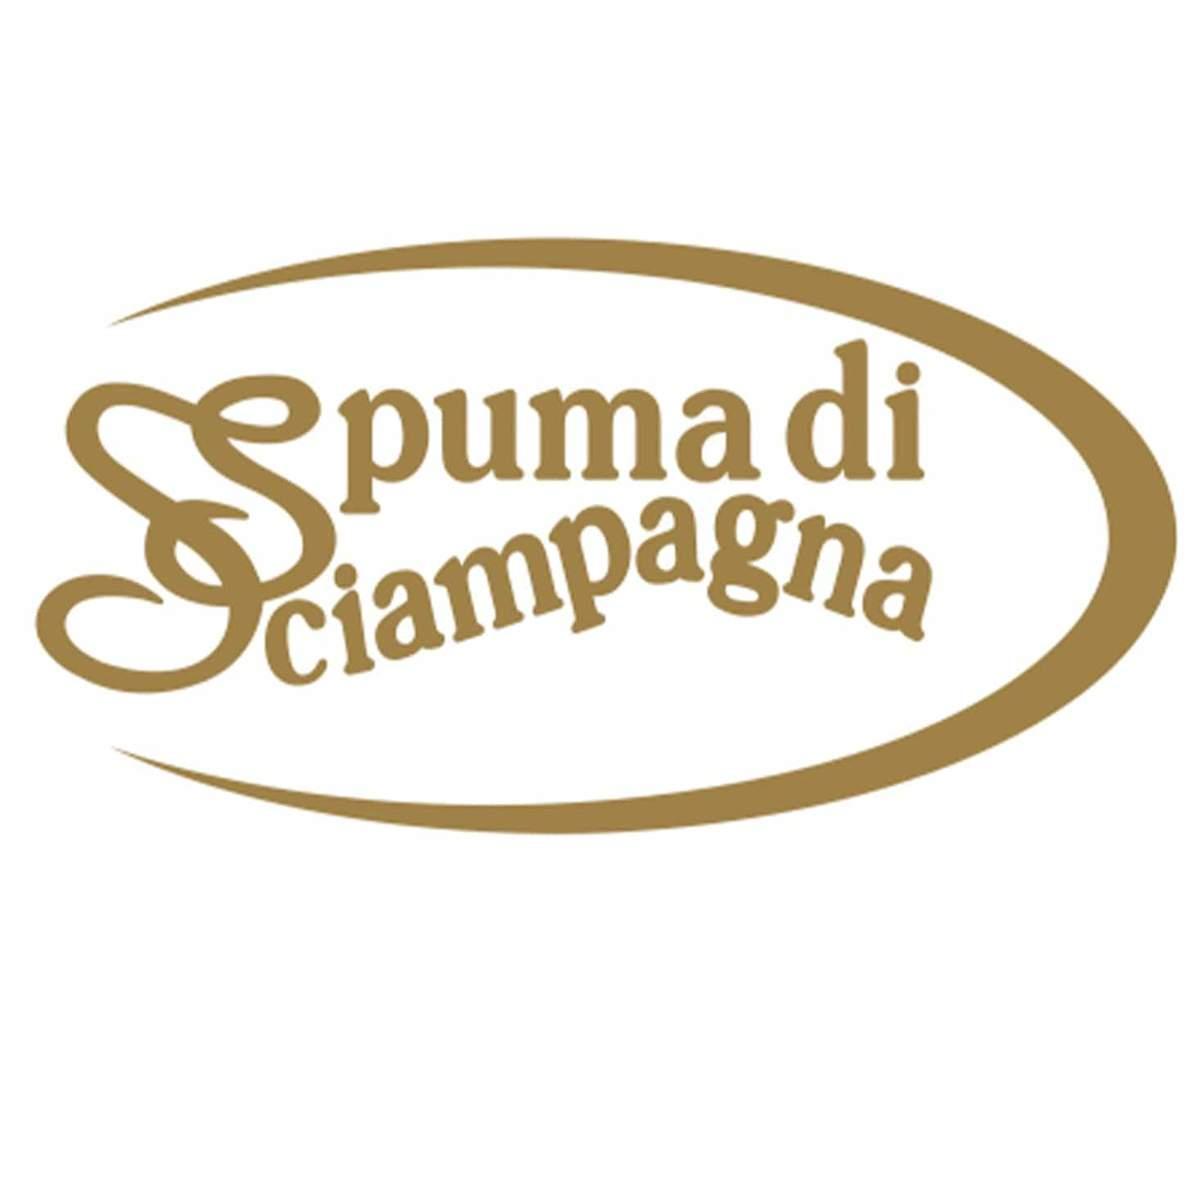 spuma_di_ciampagna_logo